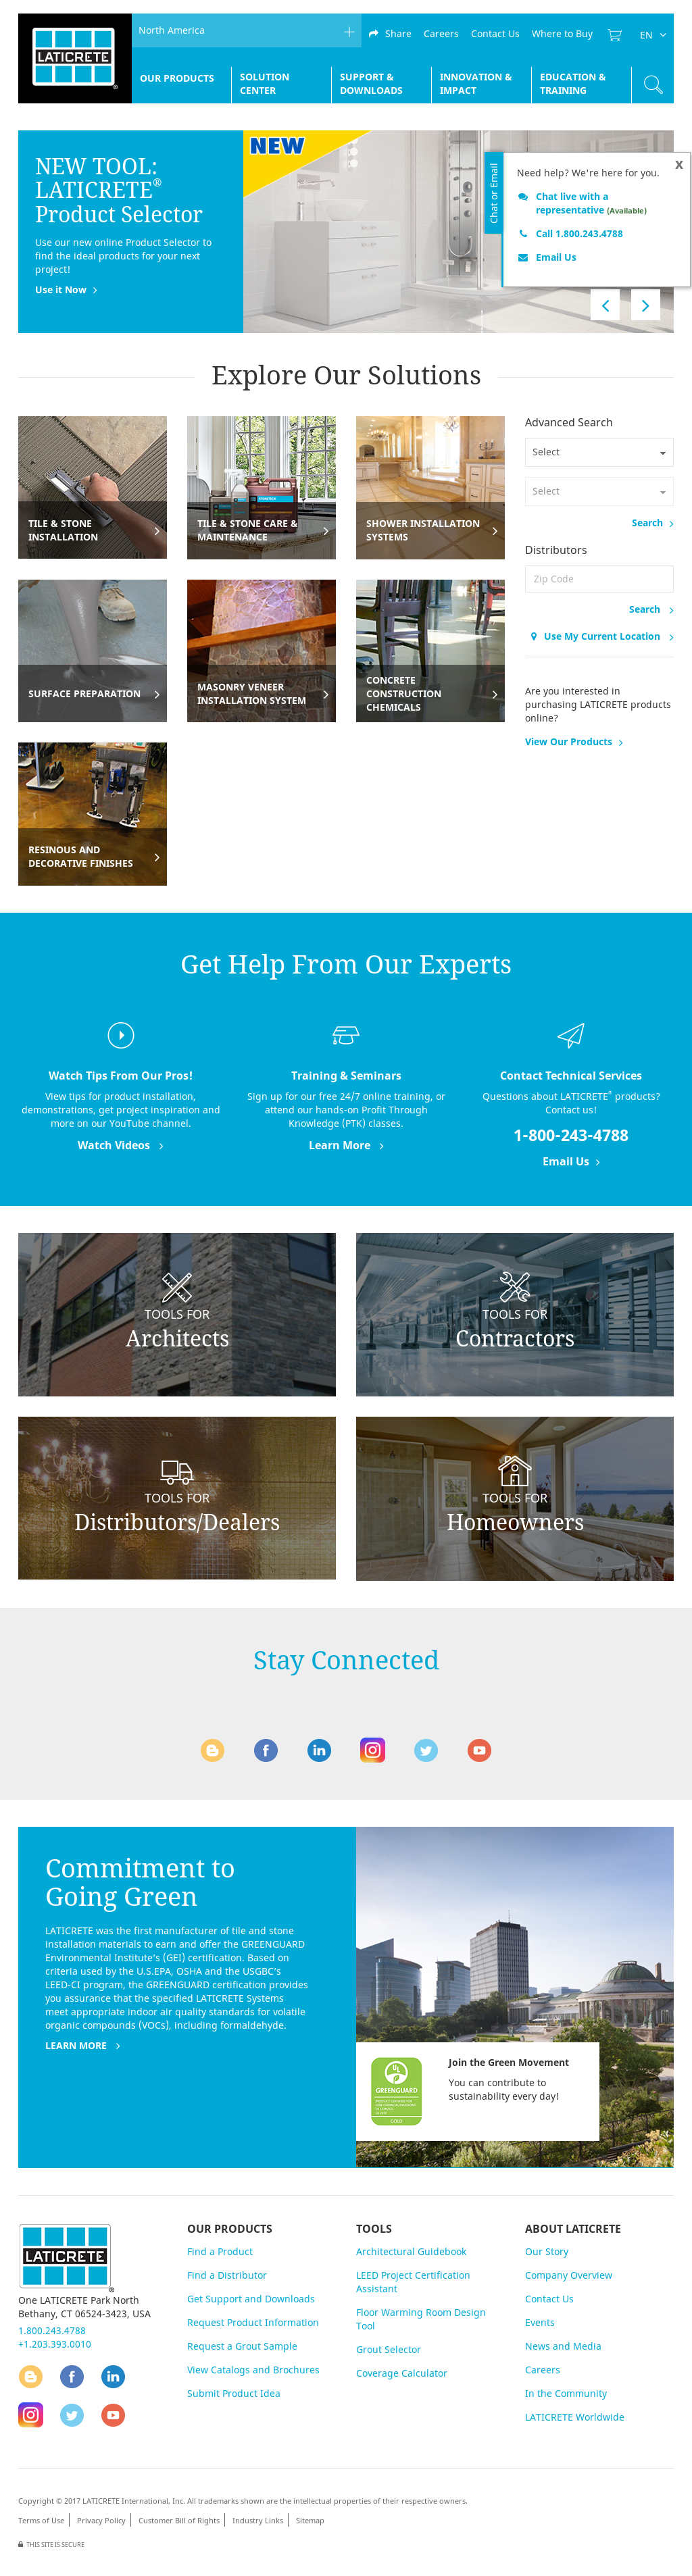 Laticrete Competitors, Revenue and Employees - Owler Company